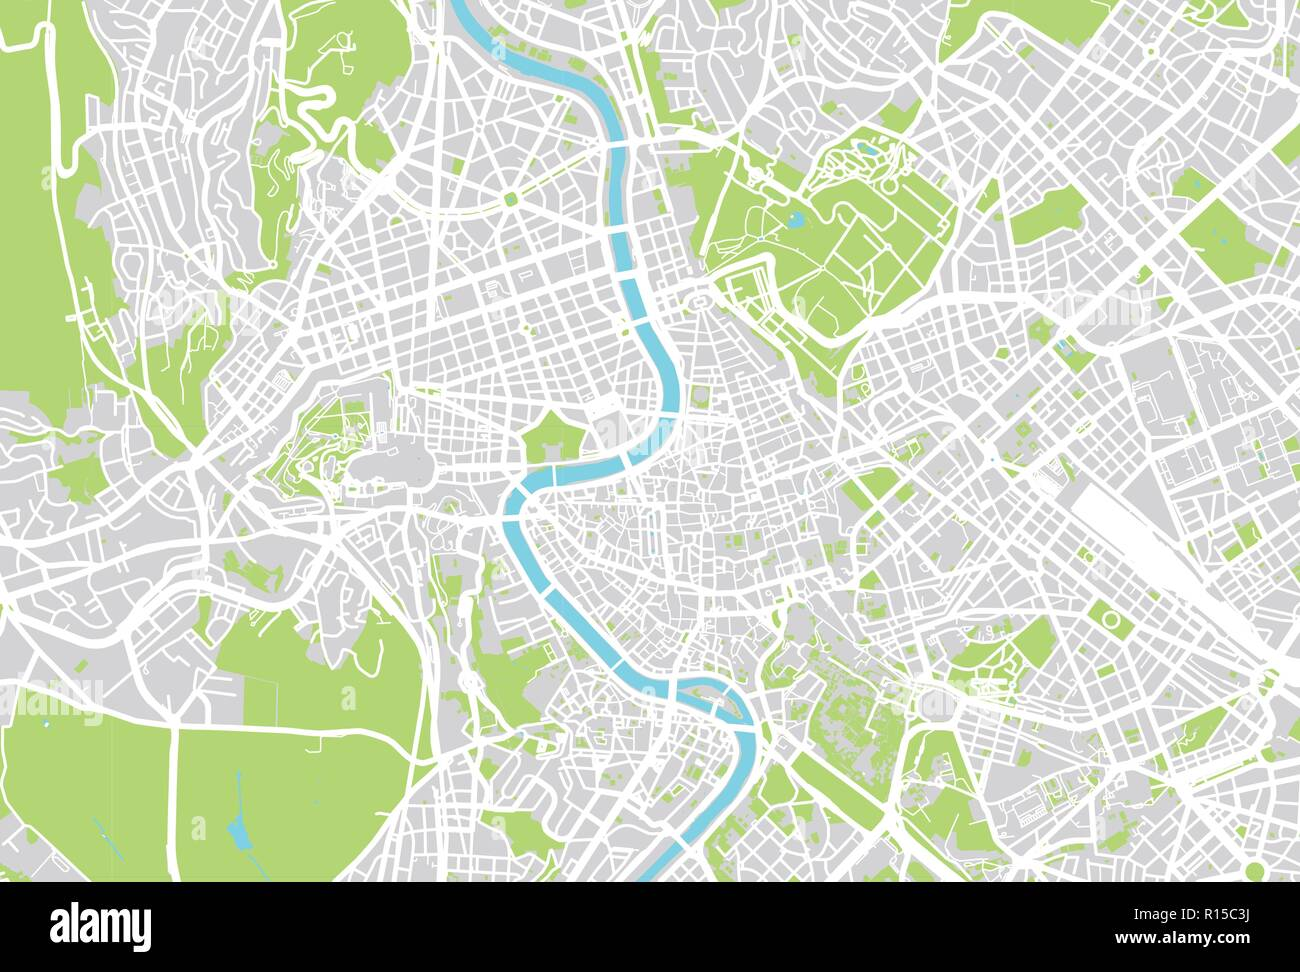 Urban vector city map of Rome, Italy Stock Vector Art ...